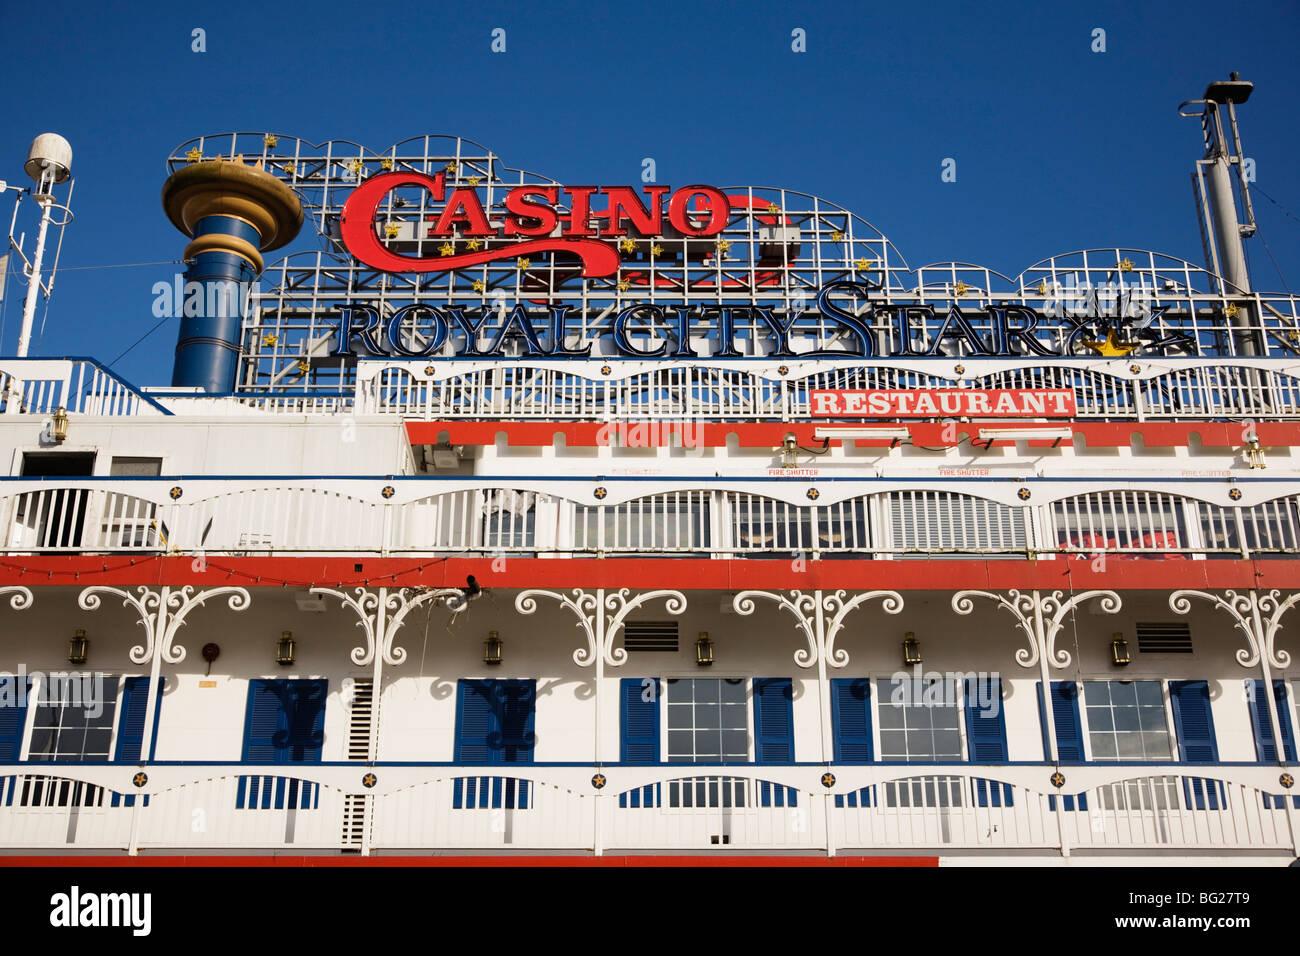 New casino in nre westminster cherokee casino tal